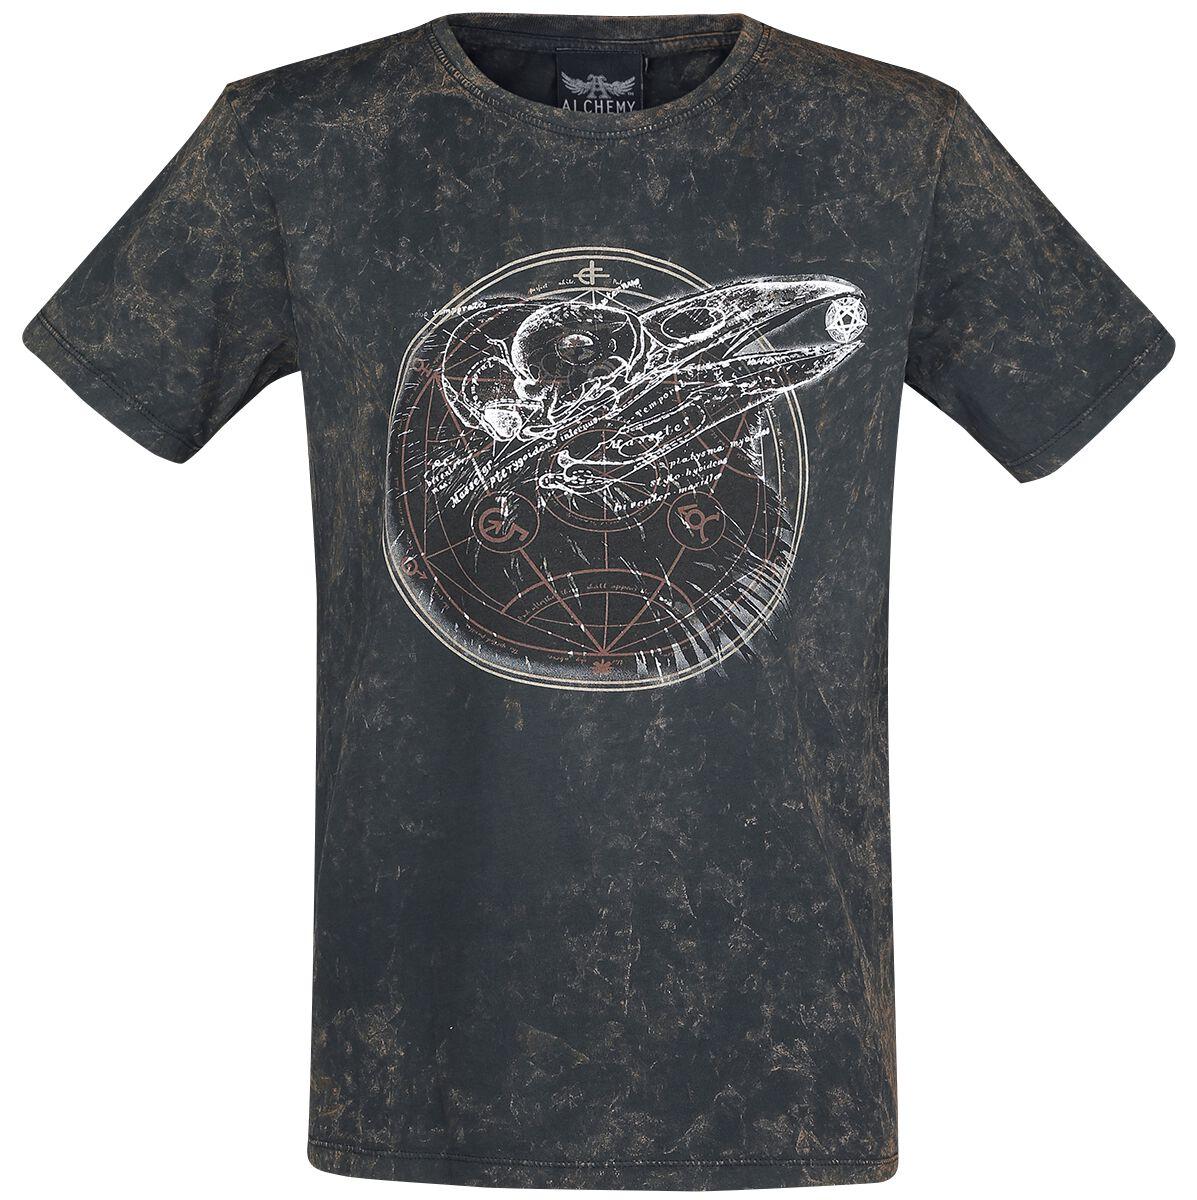 Image of   Alchemy England An Eye for an Eye T-Shirt mørk brun